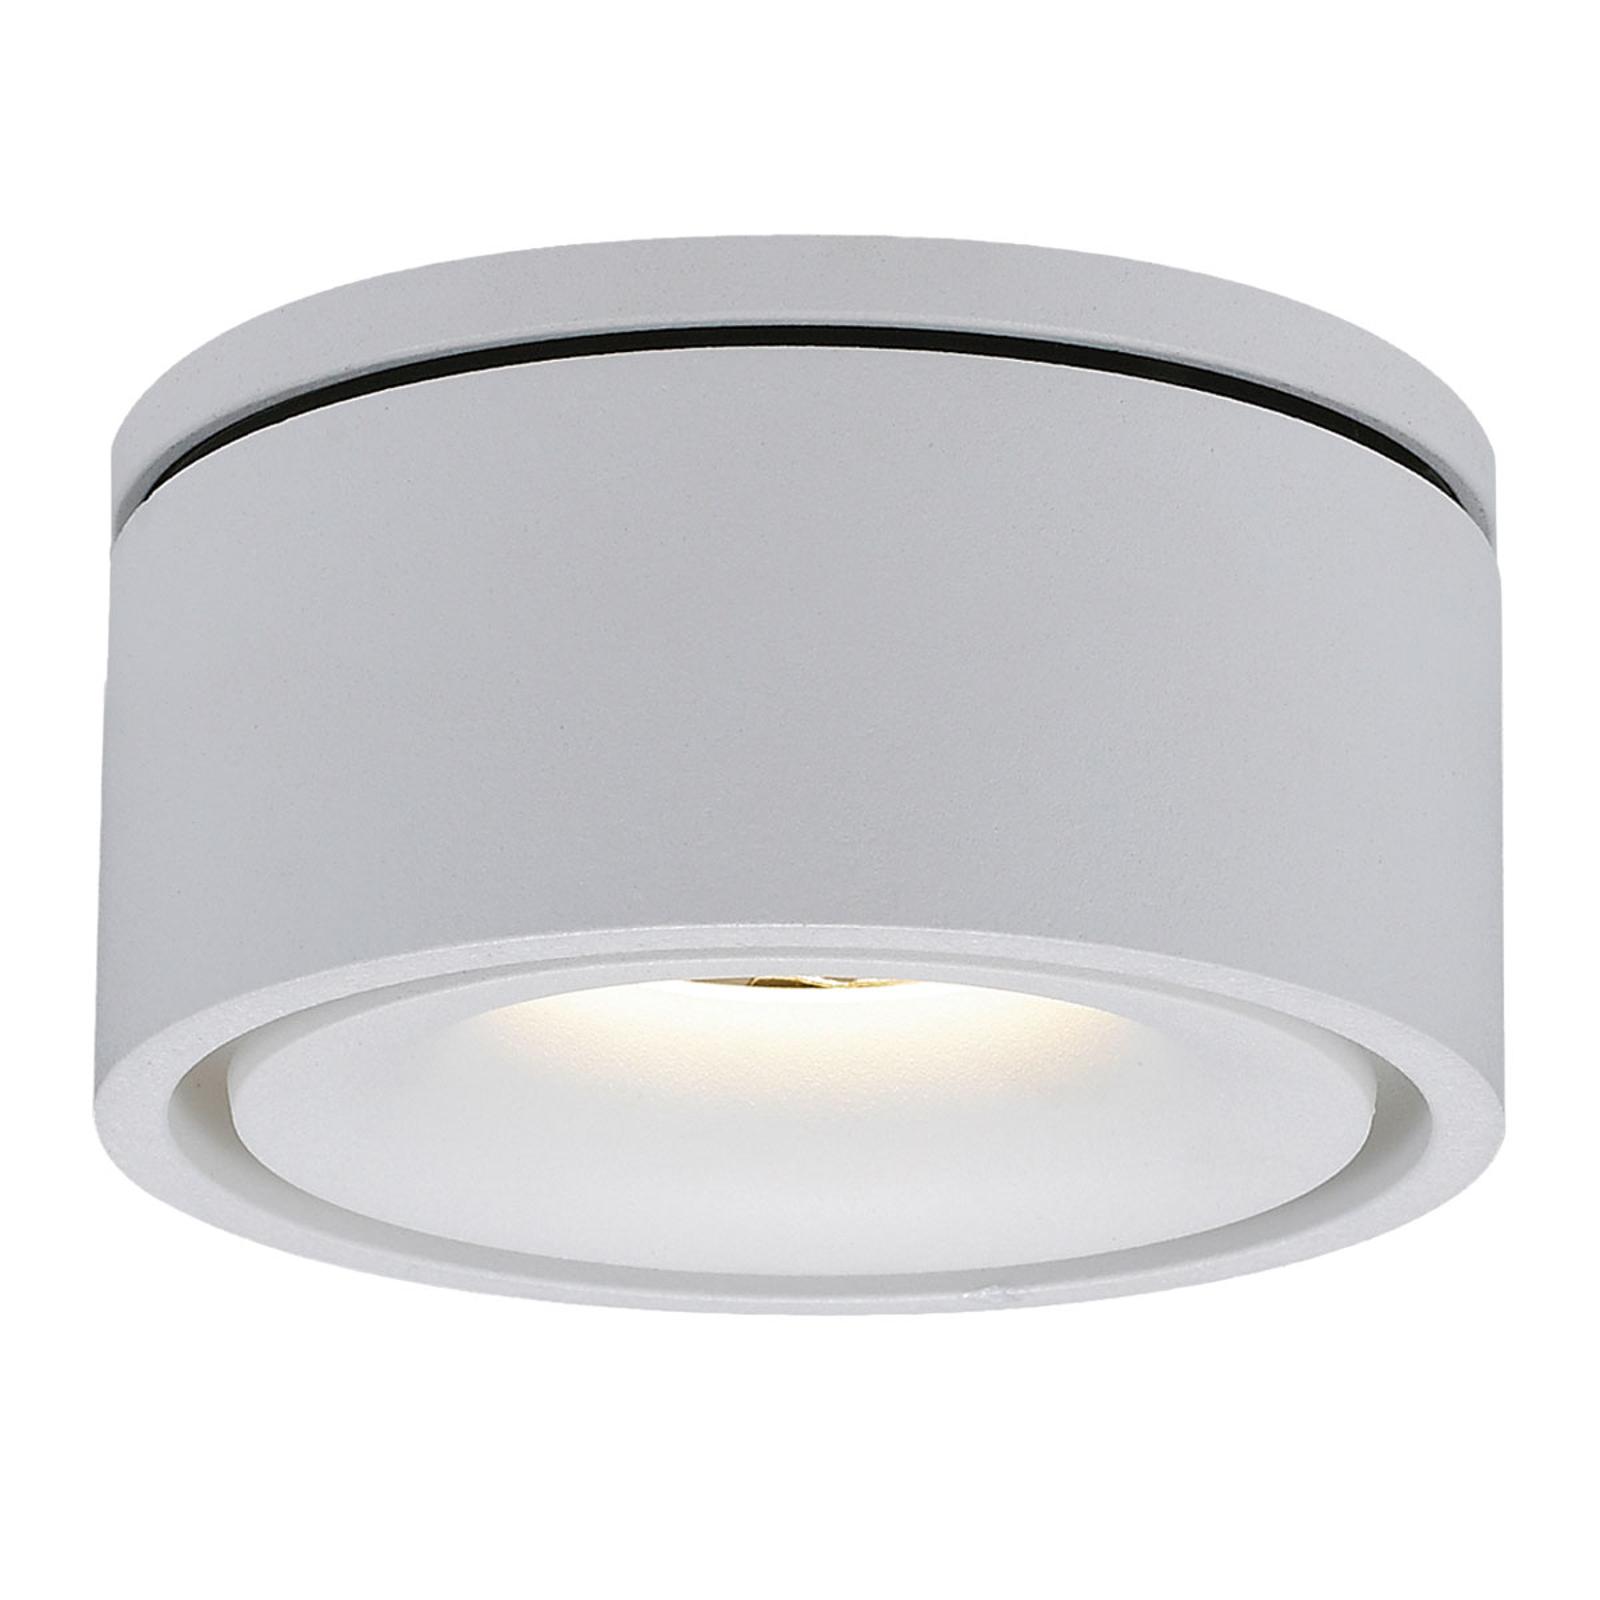 LED-Einbaustrahler Tivoli-E, dreh- und schwenkbar